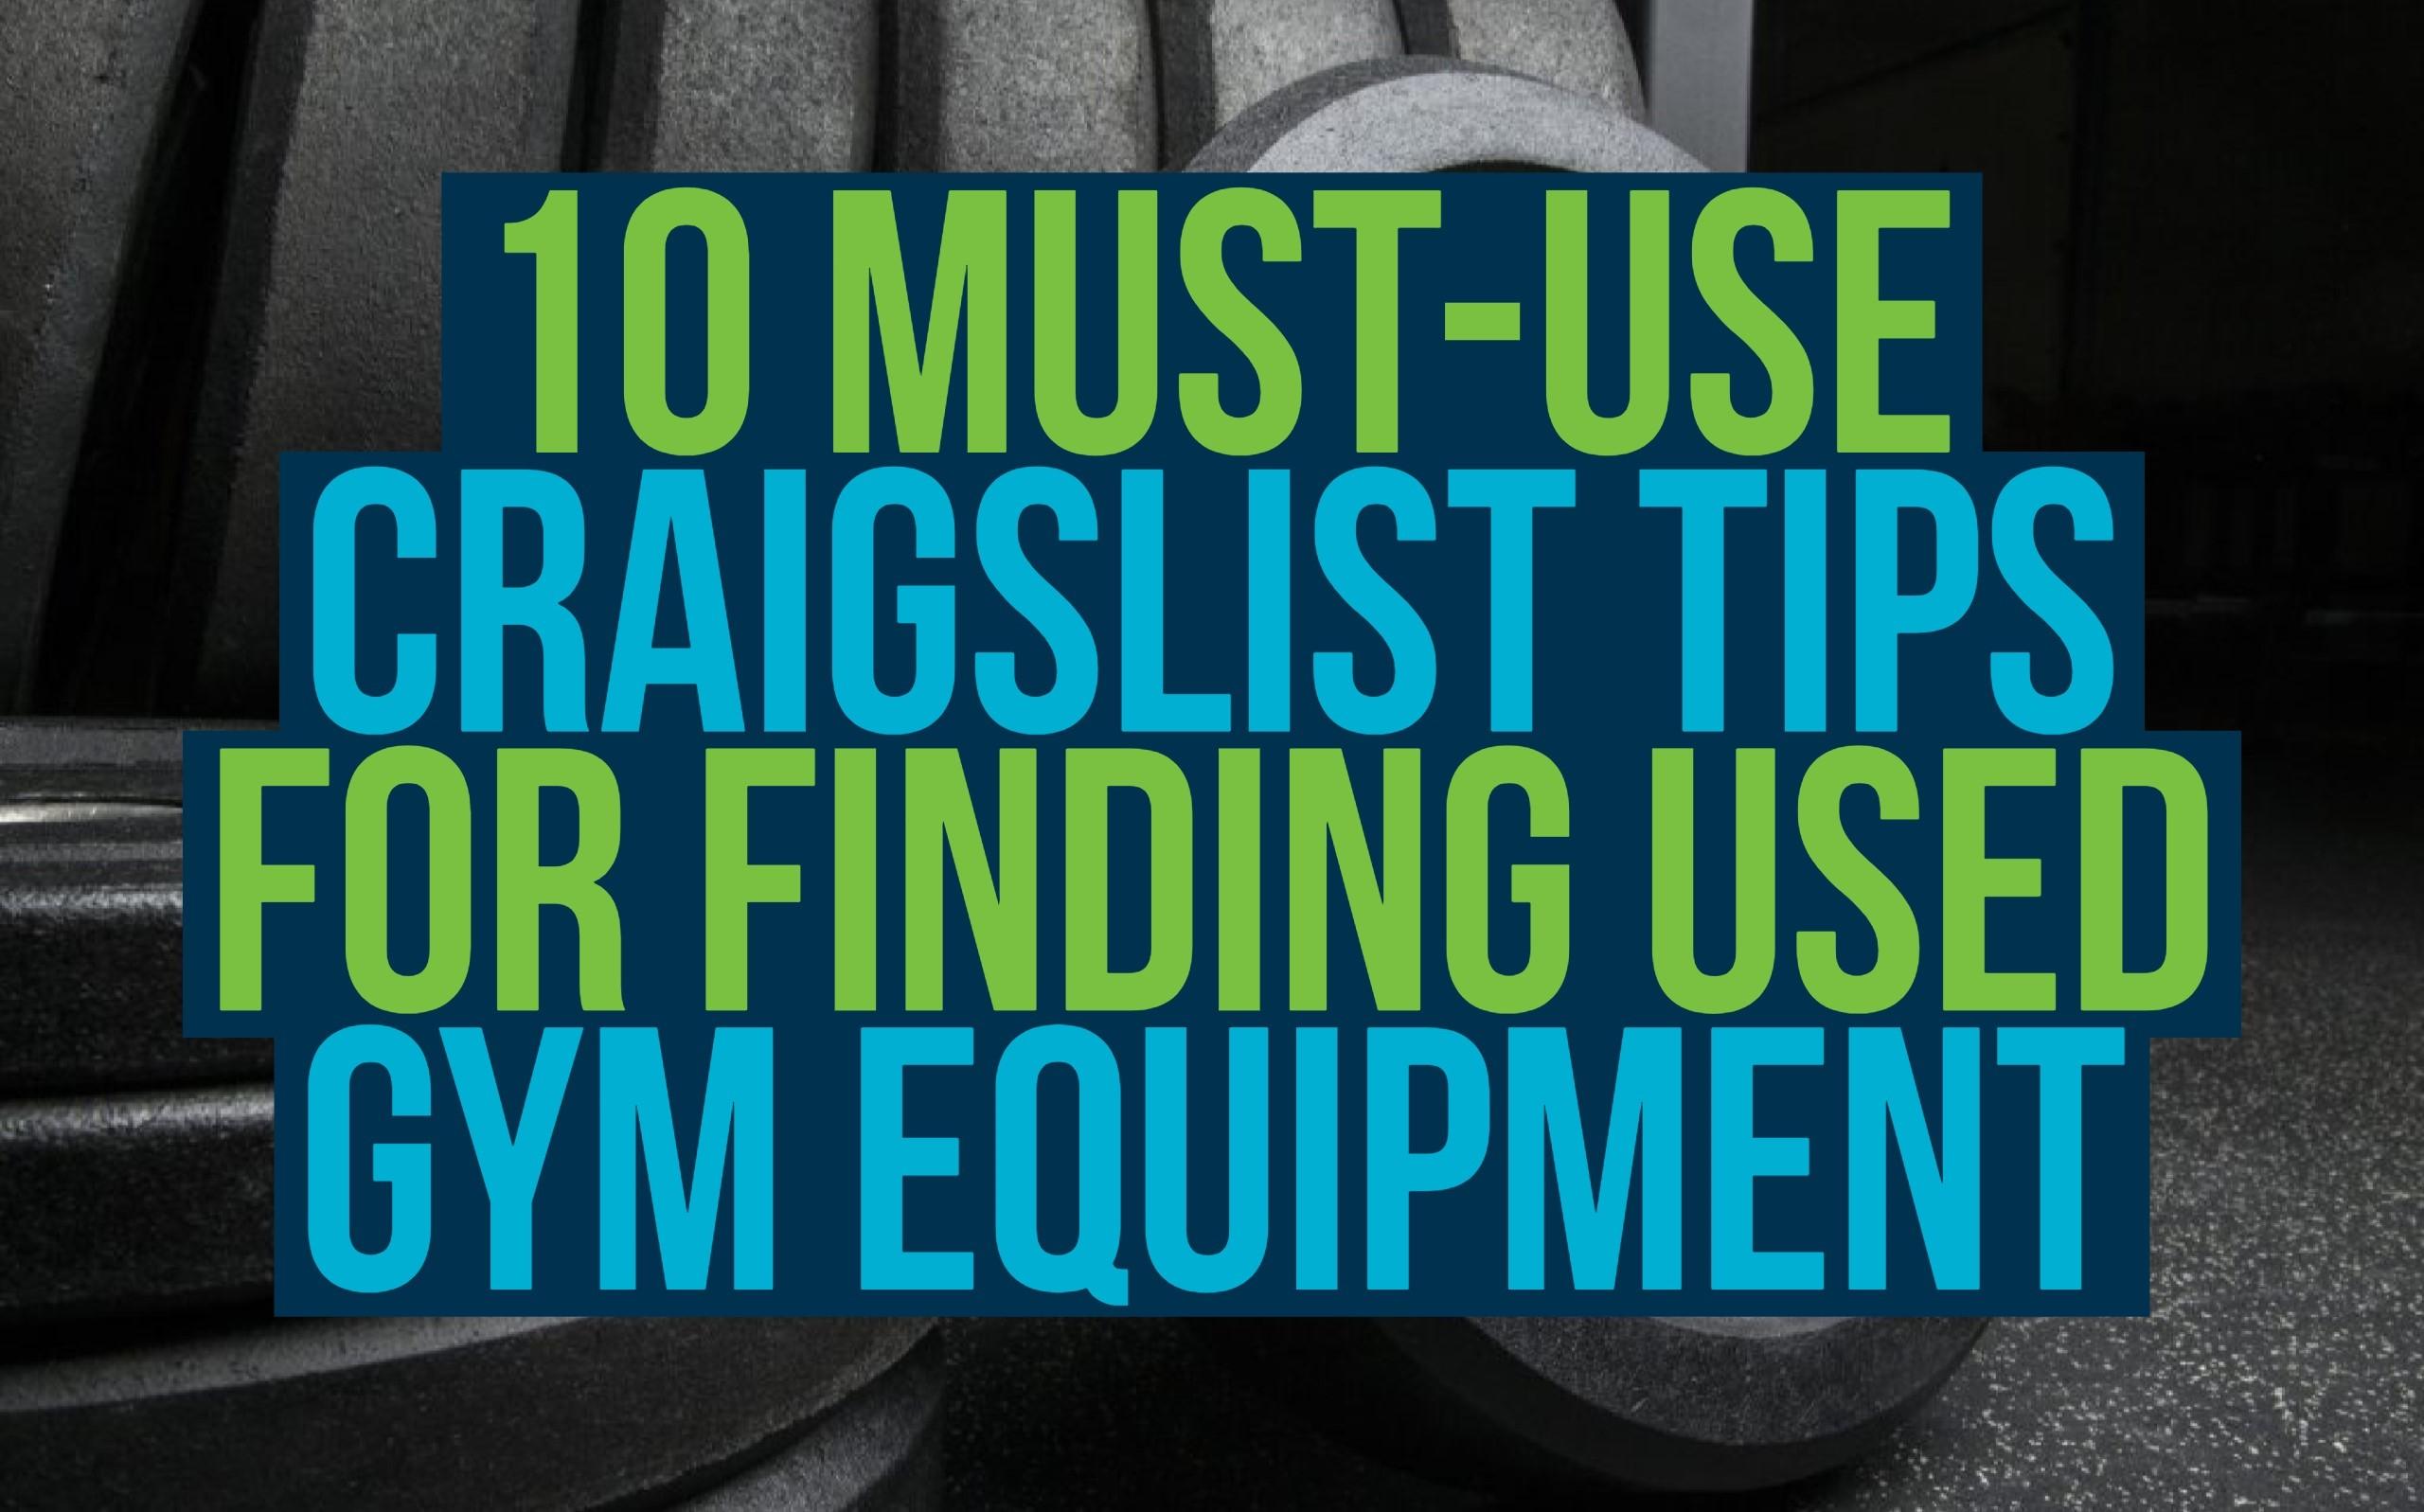 Crossfit Equipment For Sale Craigslist